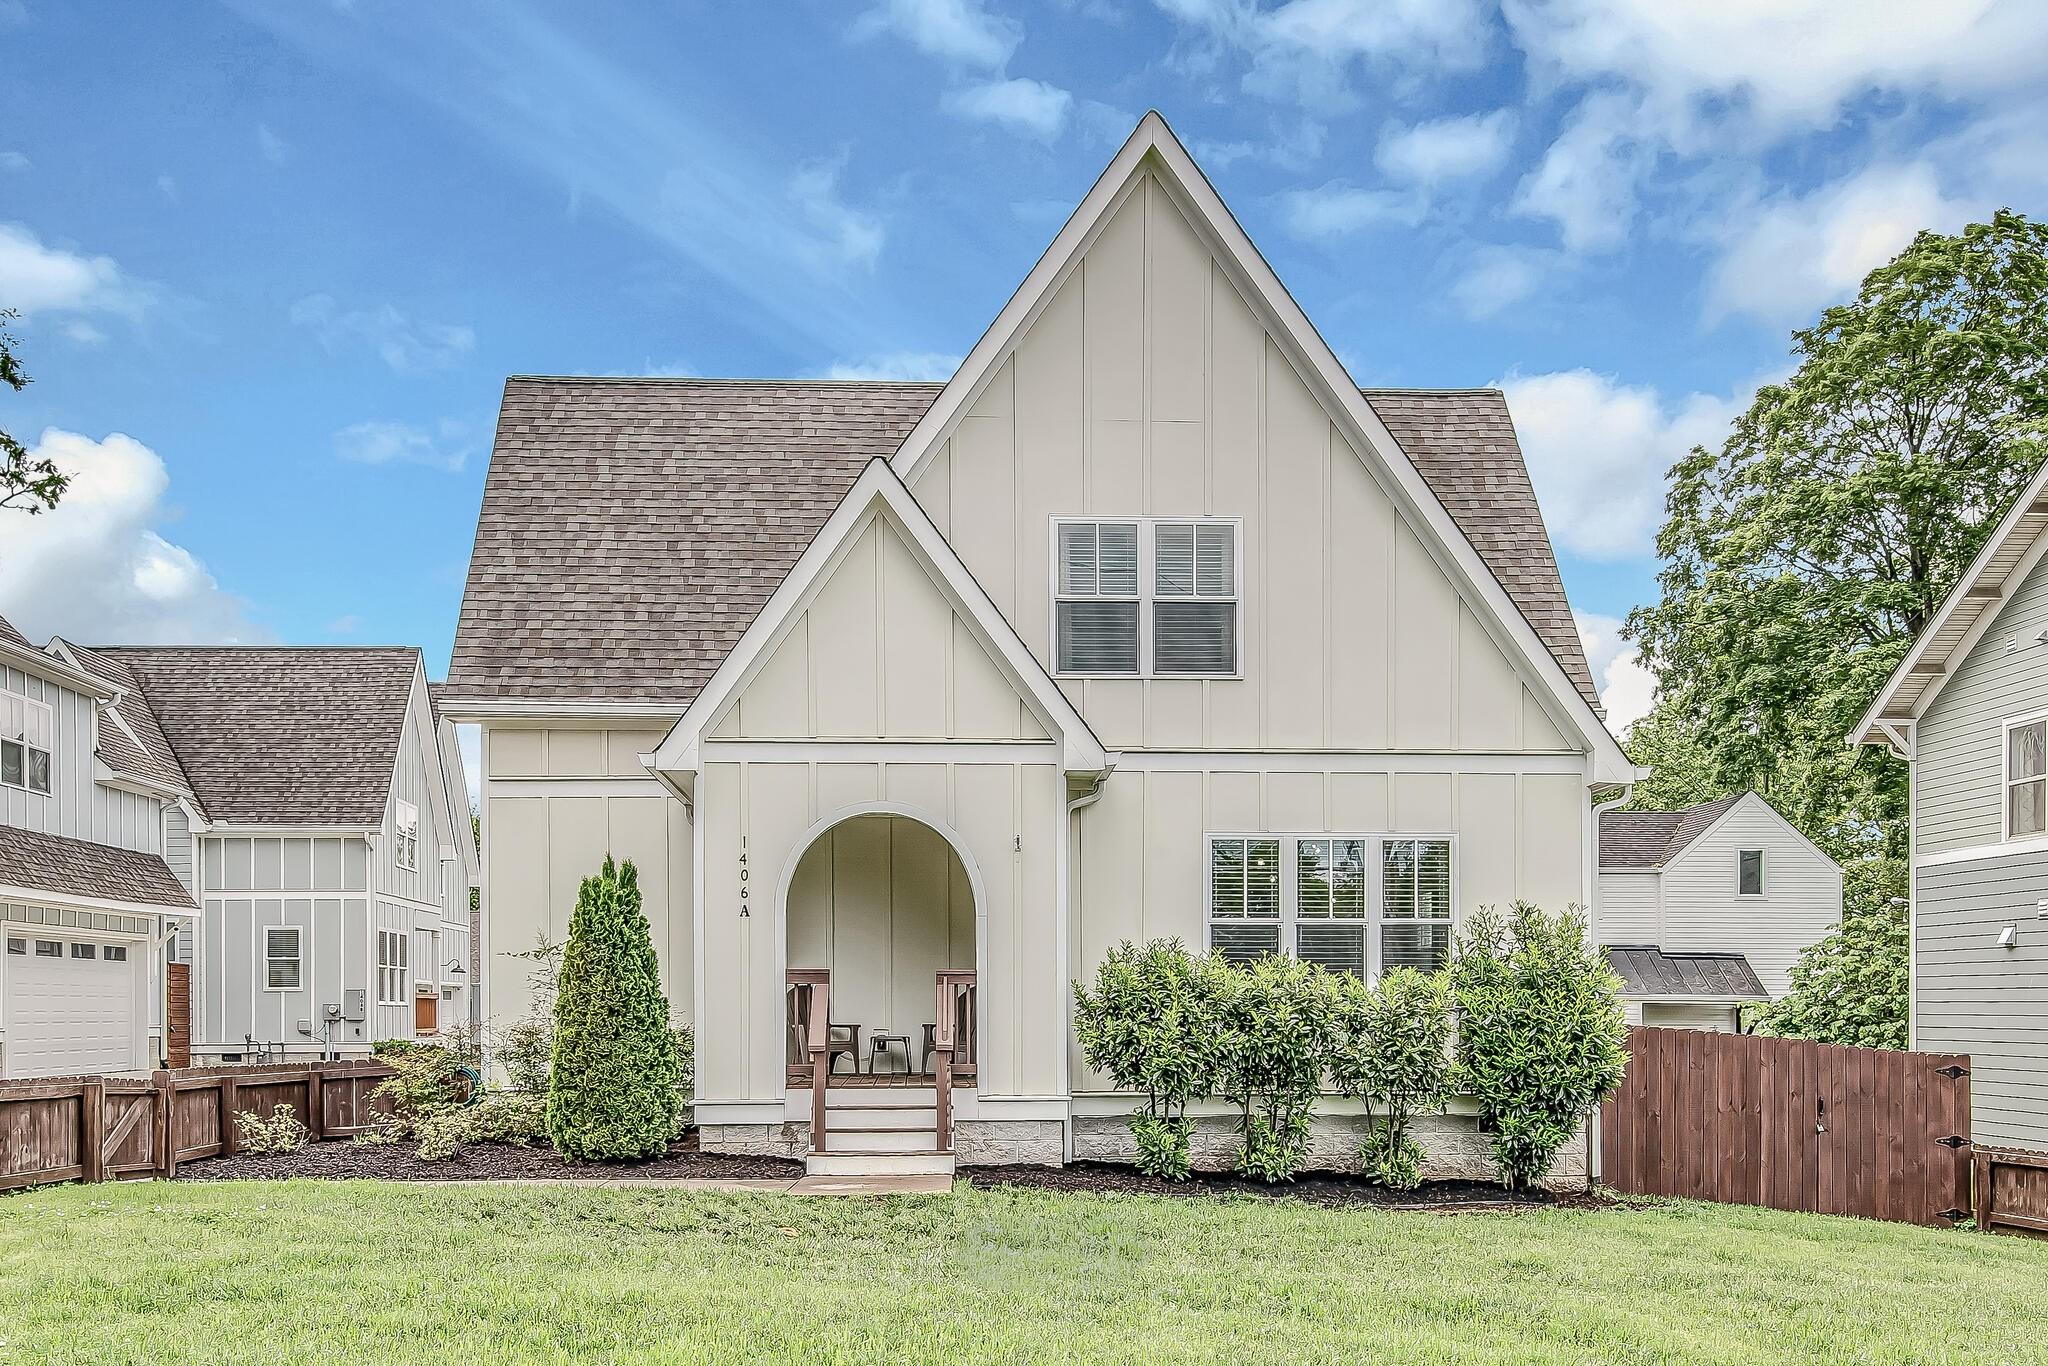 1406A Otay St Property Photo - Nashville, TN real estate listing